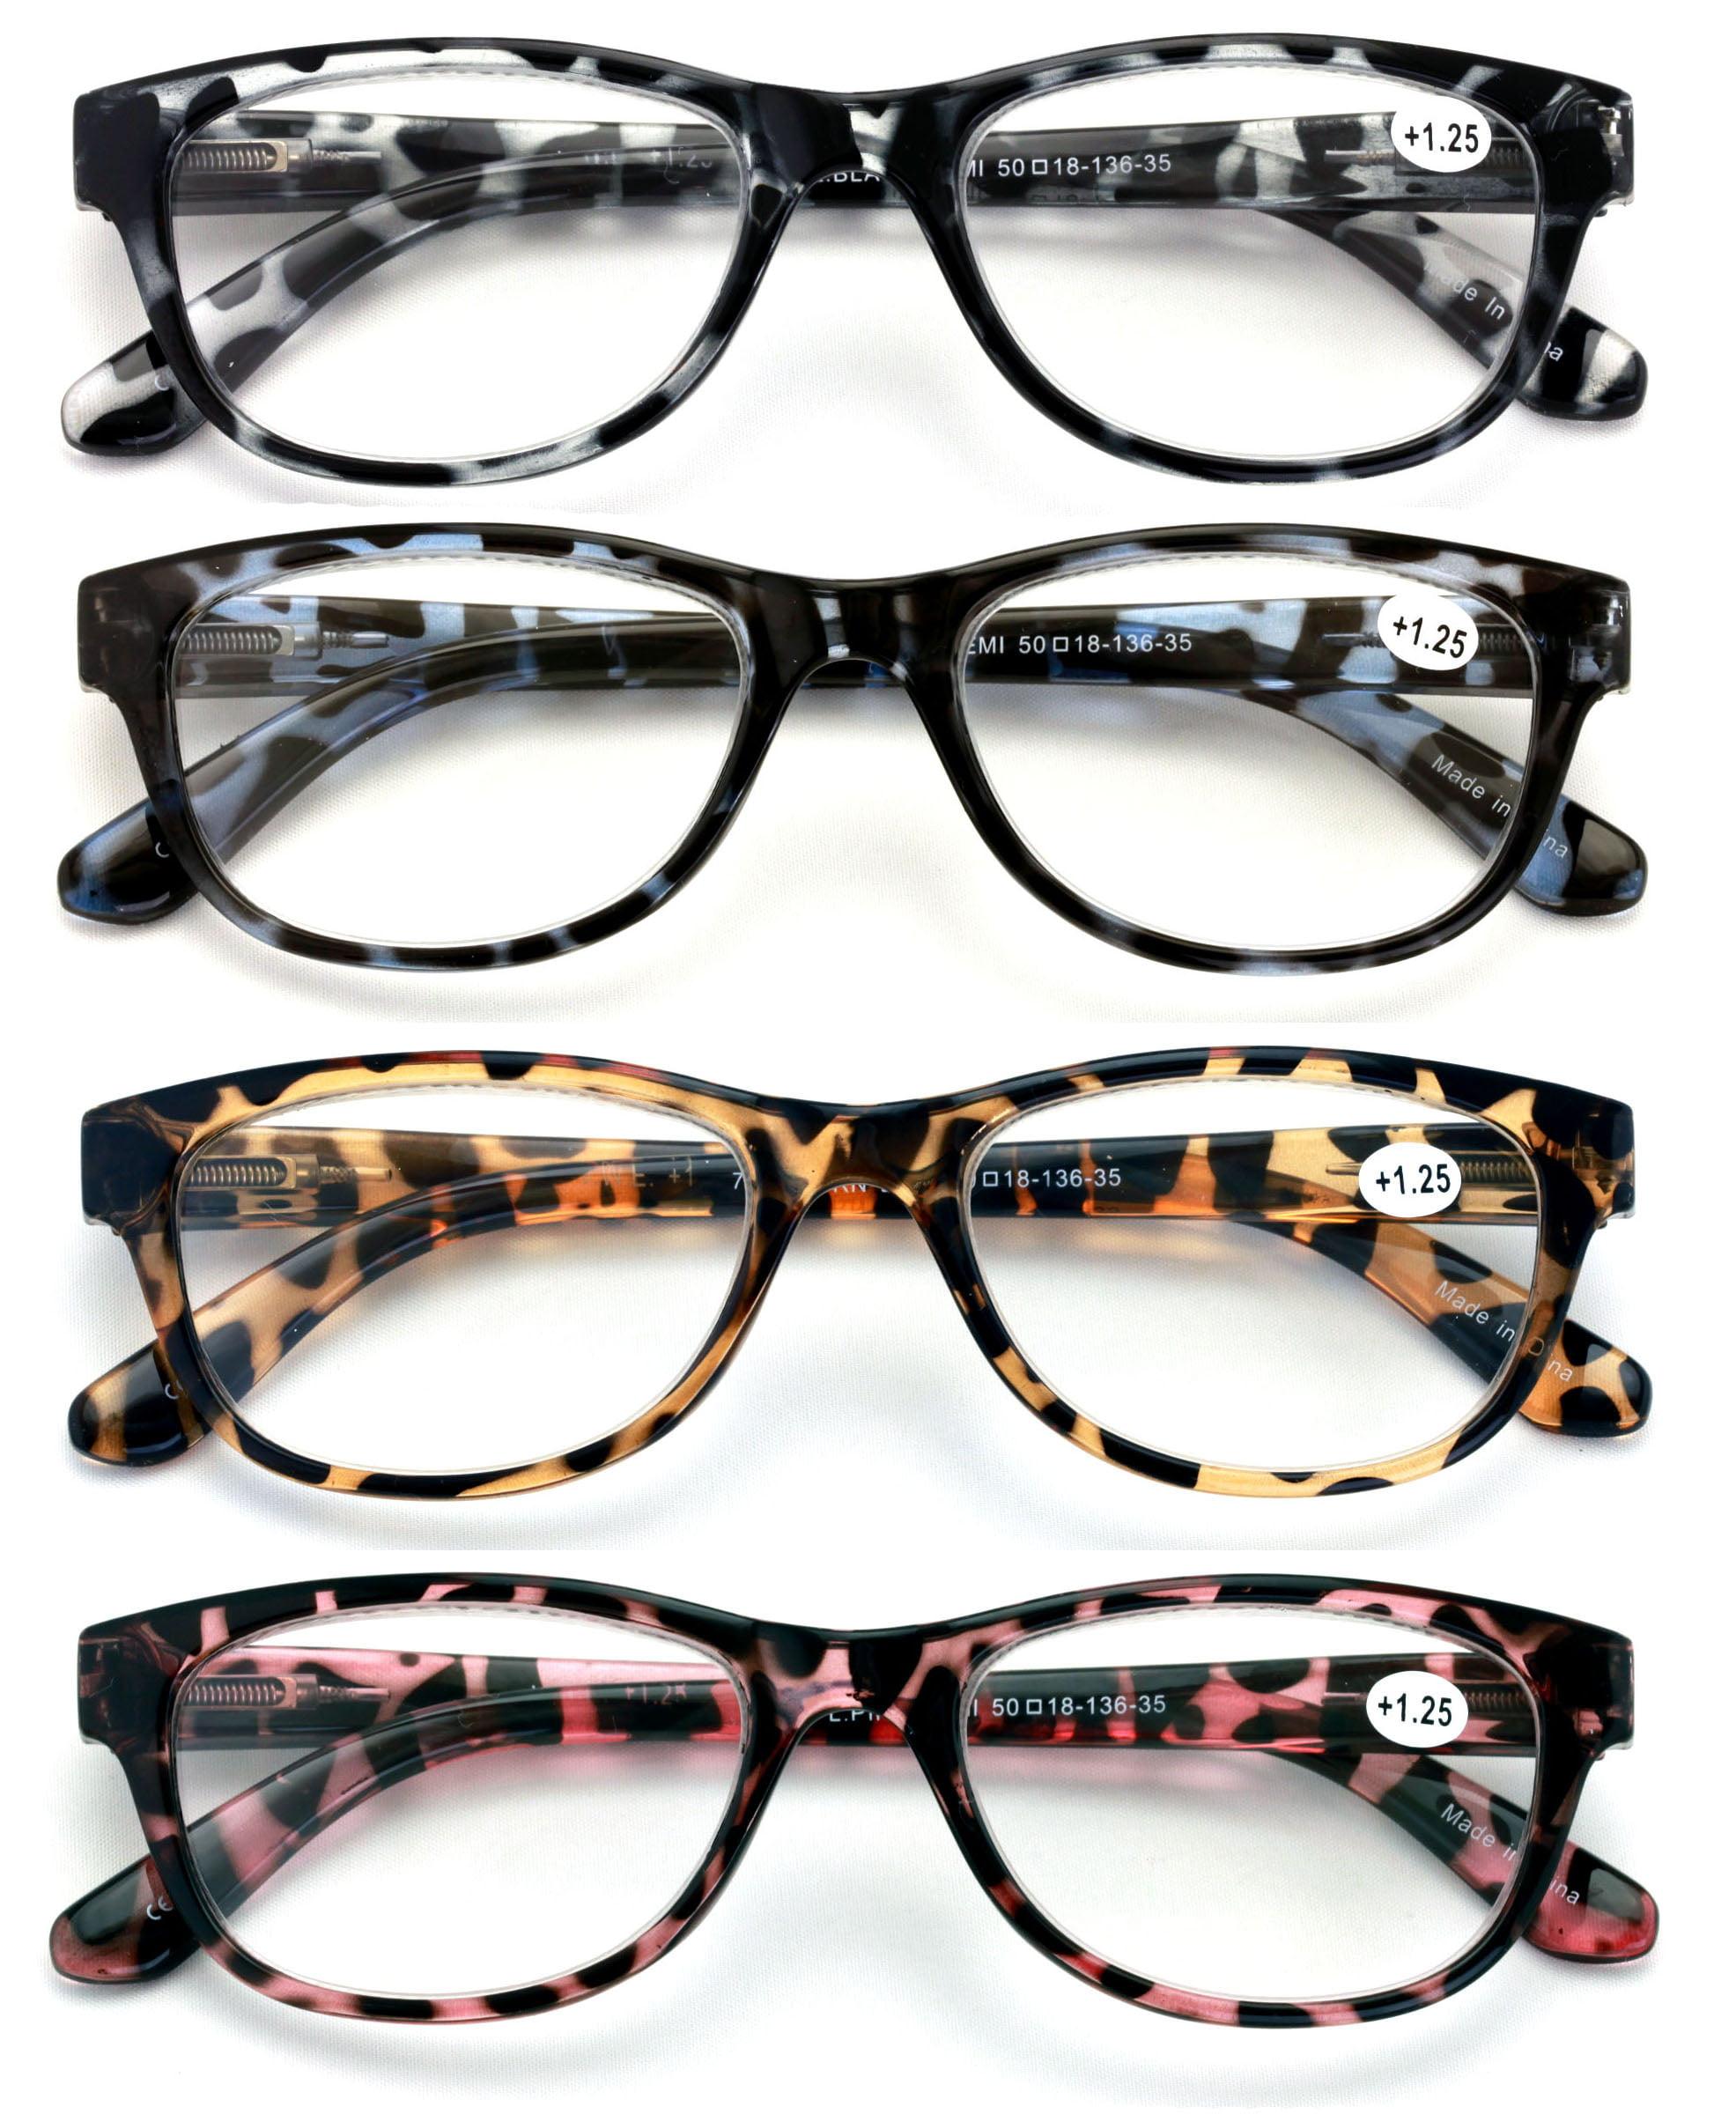 20 Pairs Women Leopard Meow Reading Glasses   Fashion Clear Lens Readers  Demi Tortoise   Walmart.com